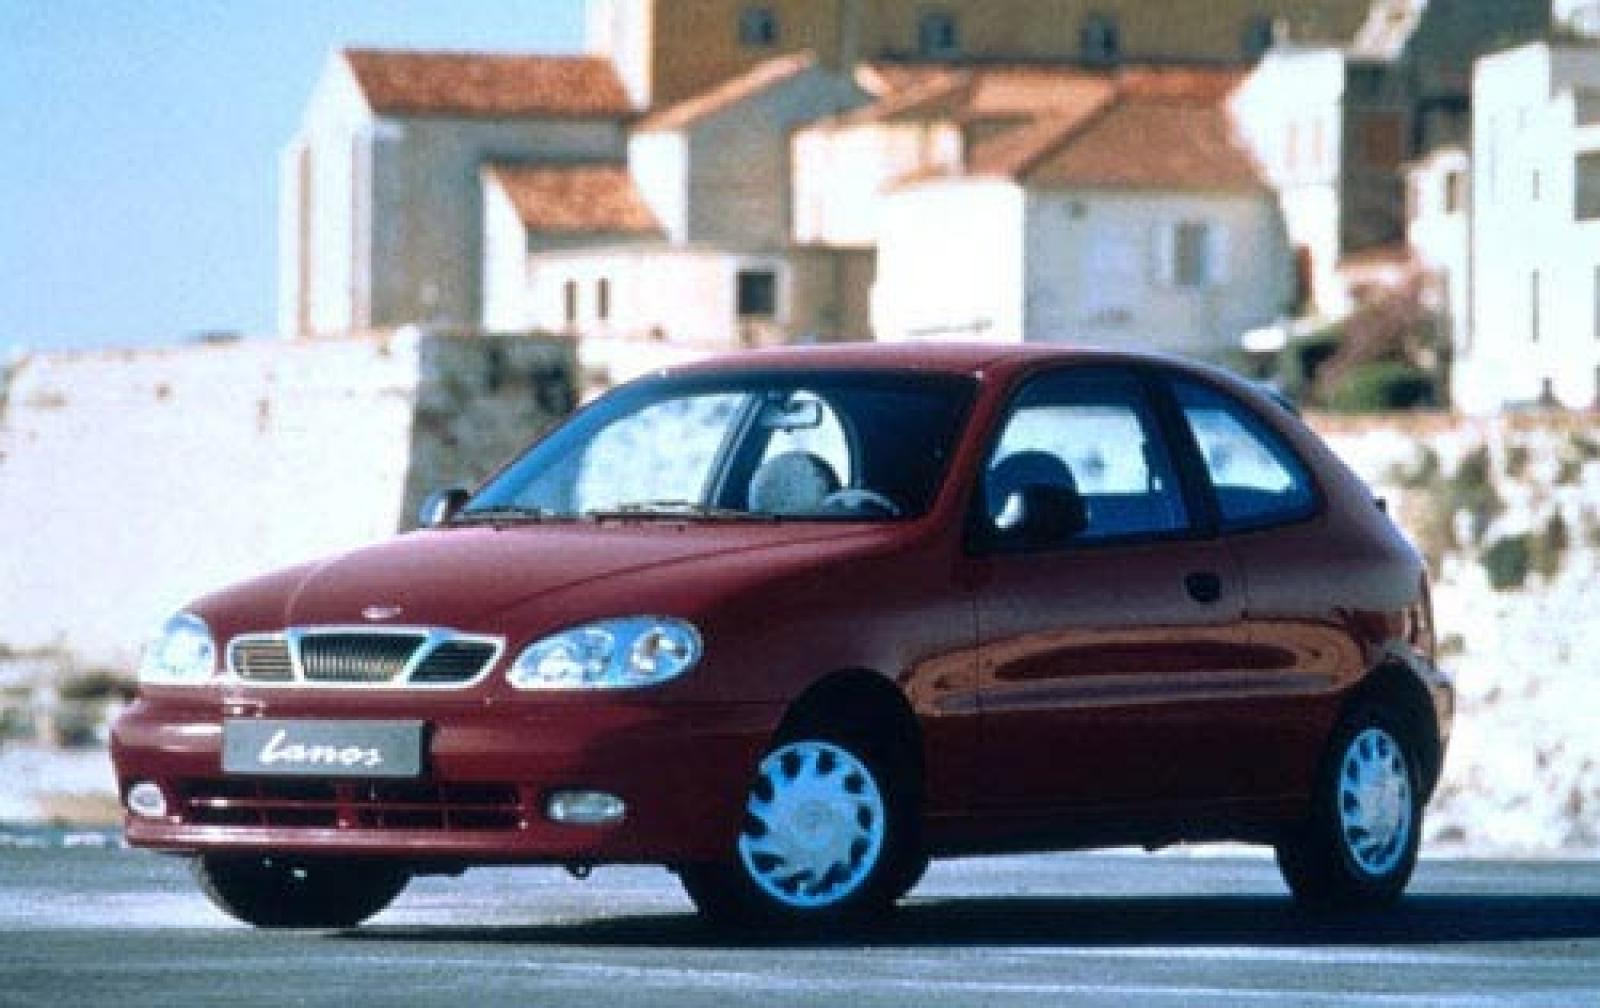 800 1024 1280 1600 origin 1999 Daewoo Lanos ...